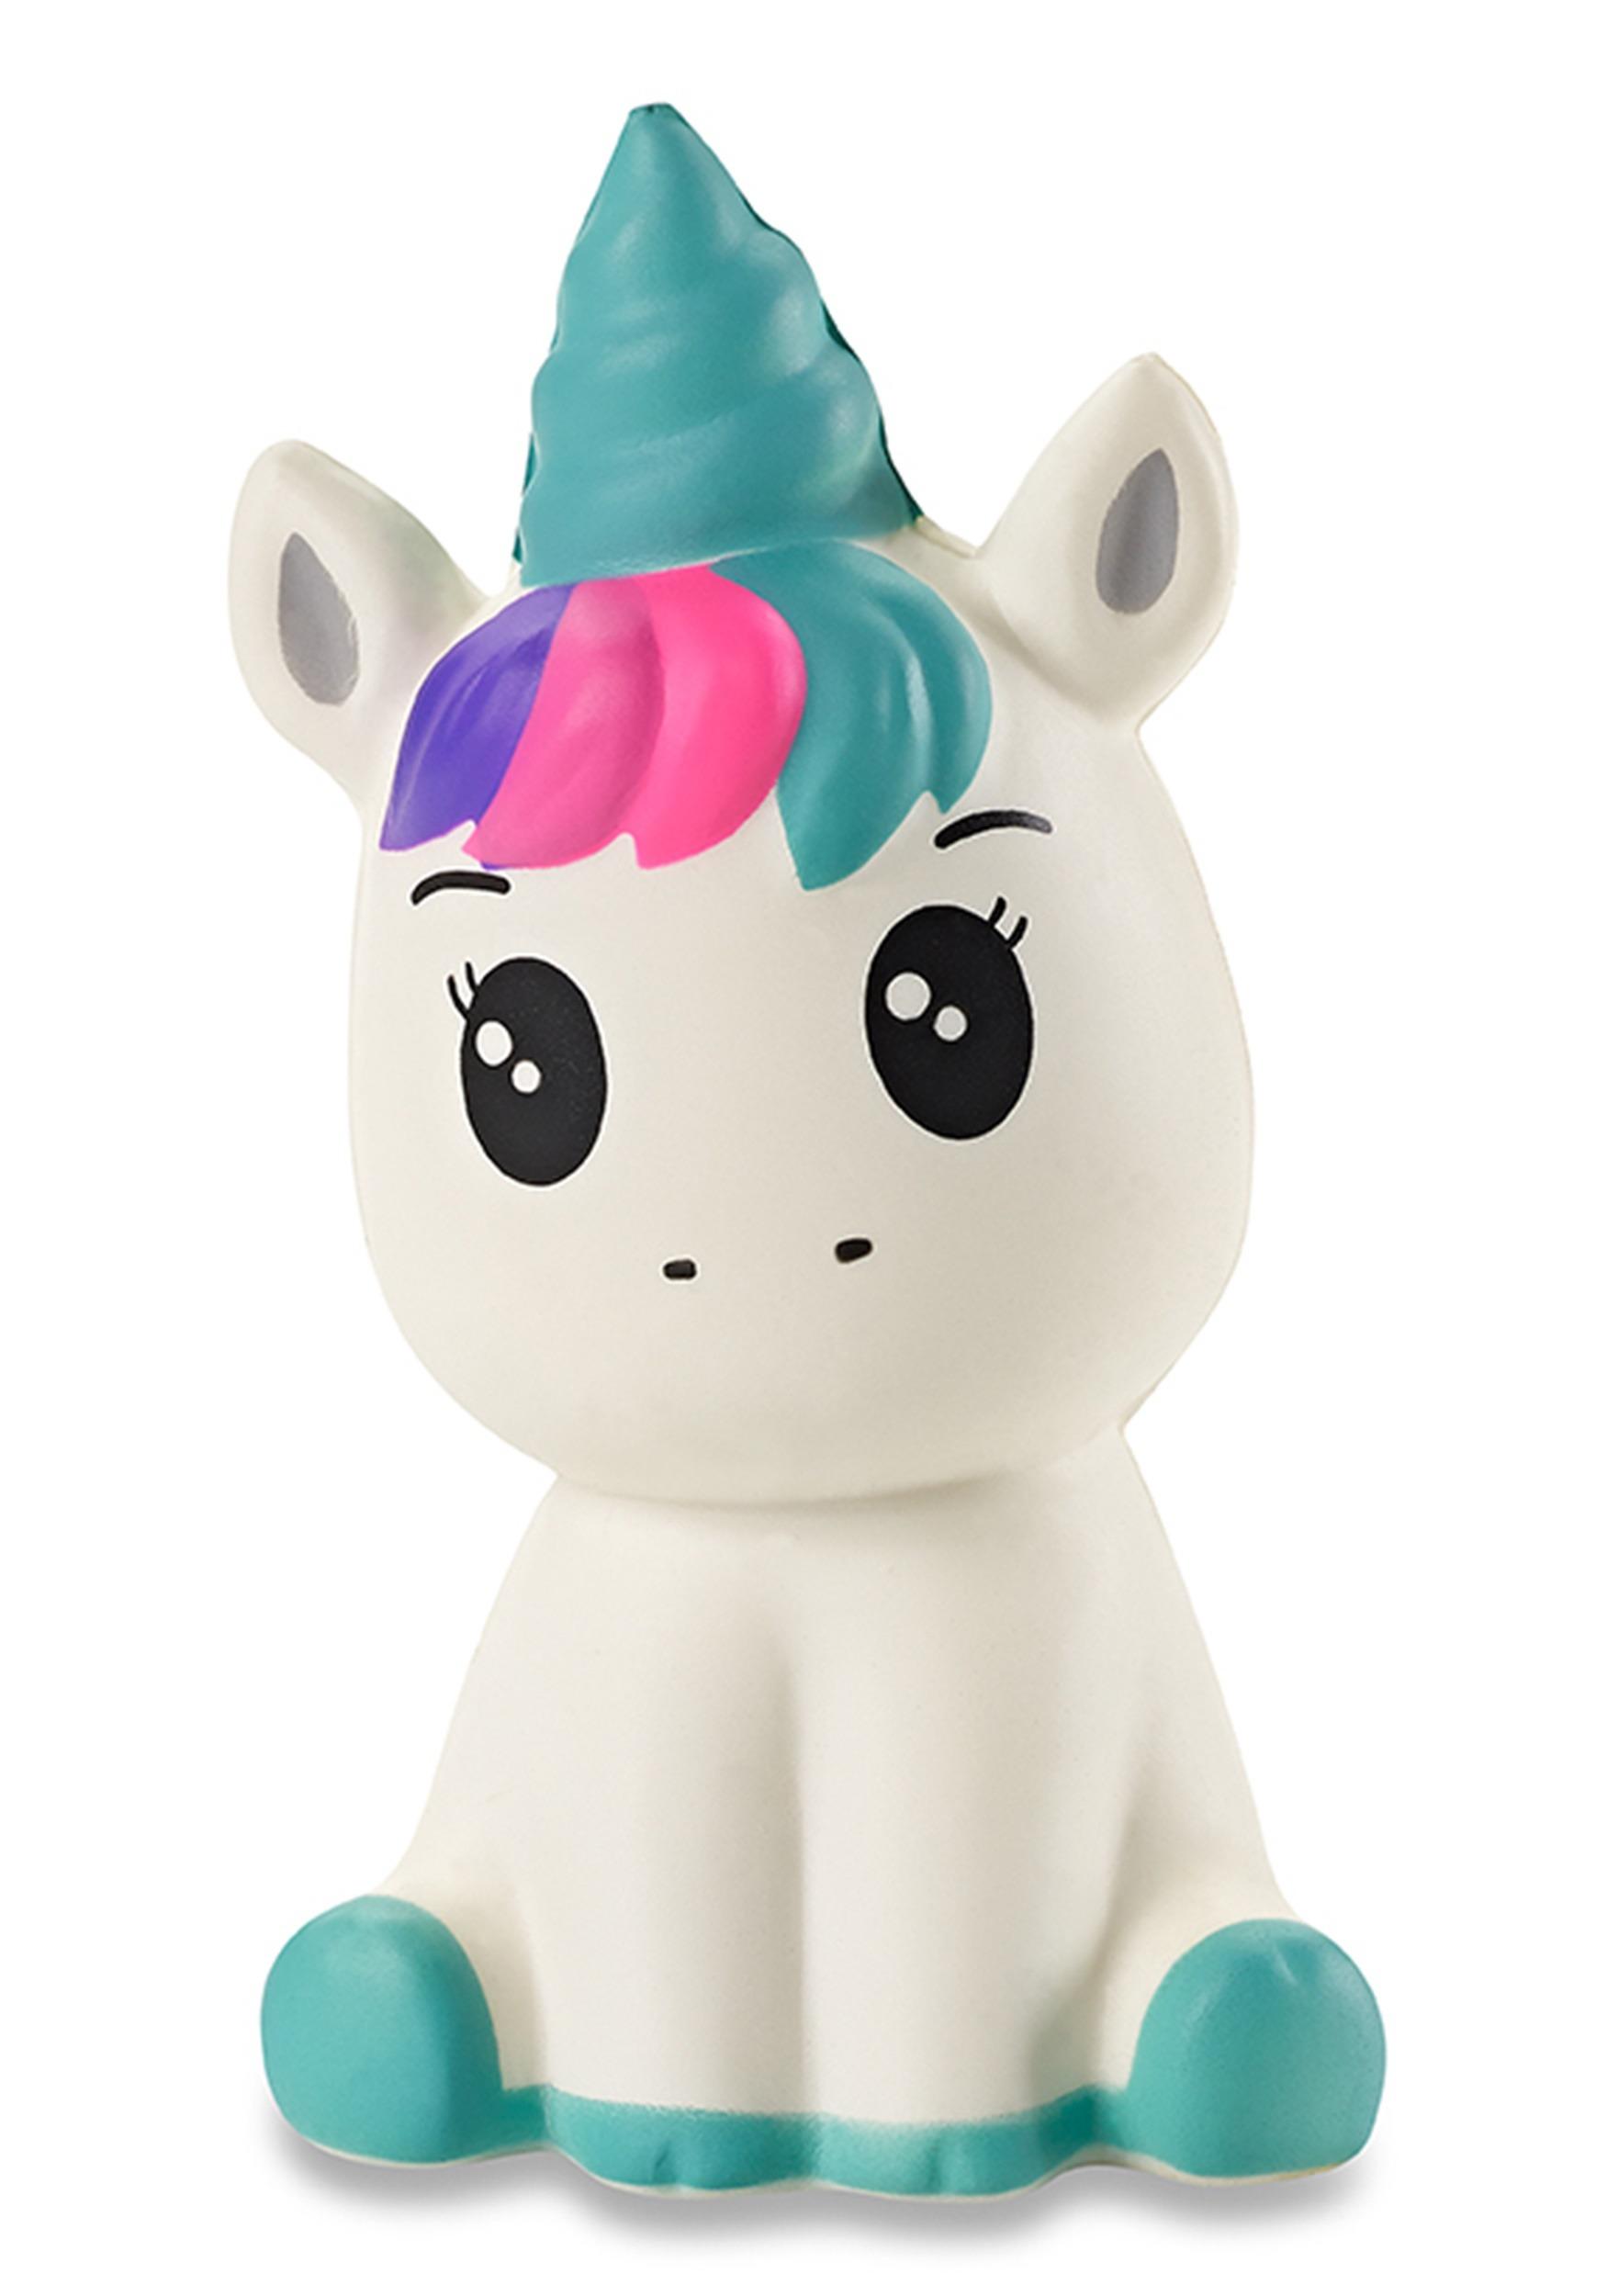 Squishy Squad 6 Jumbo Unicorn Squishy Toy